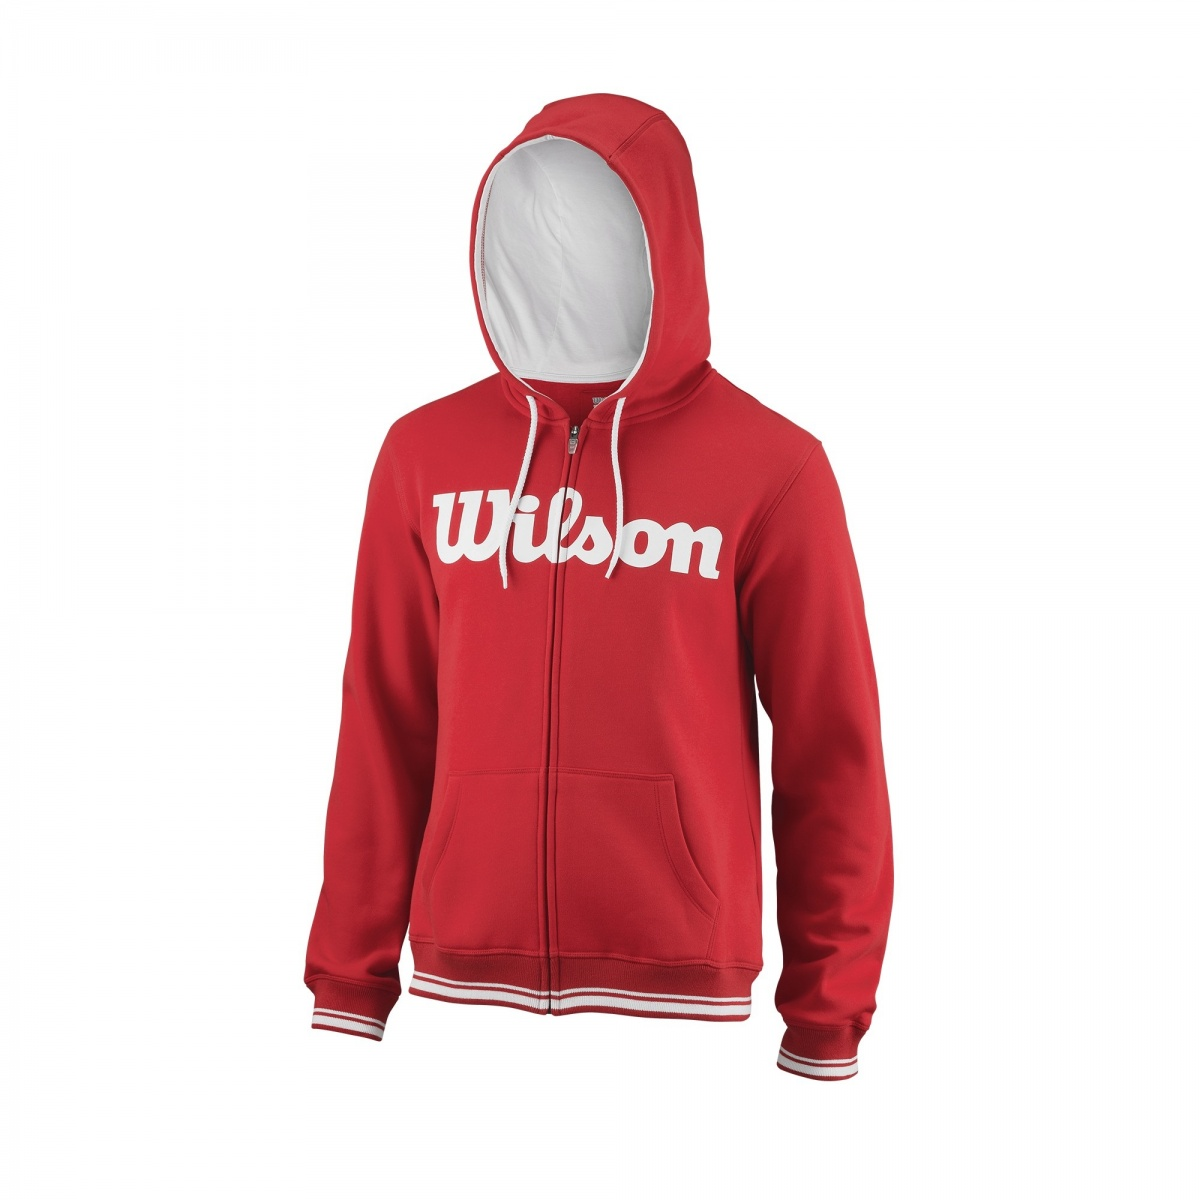 Wilson Team Script FZ Hoody Rosso Uomo 1